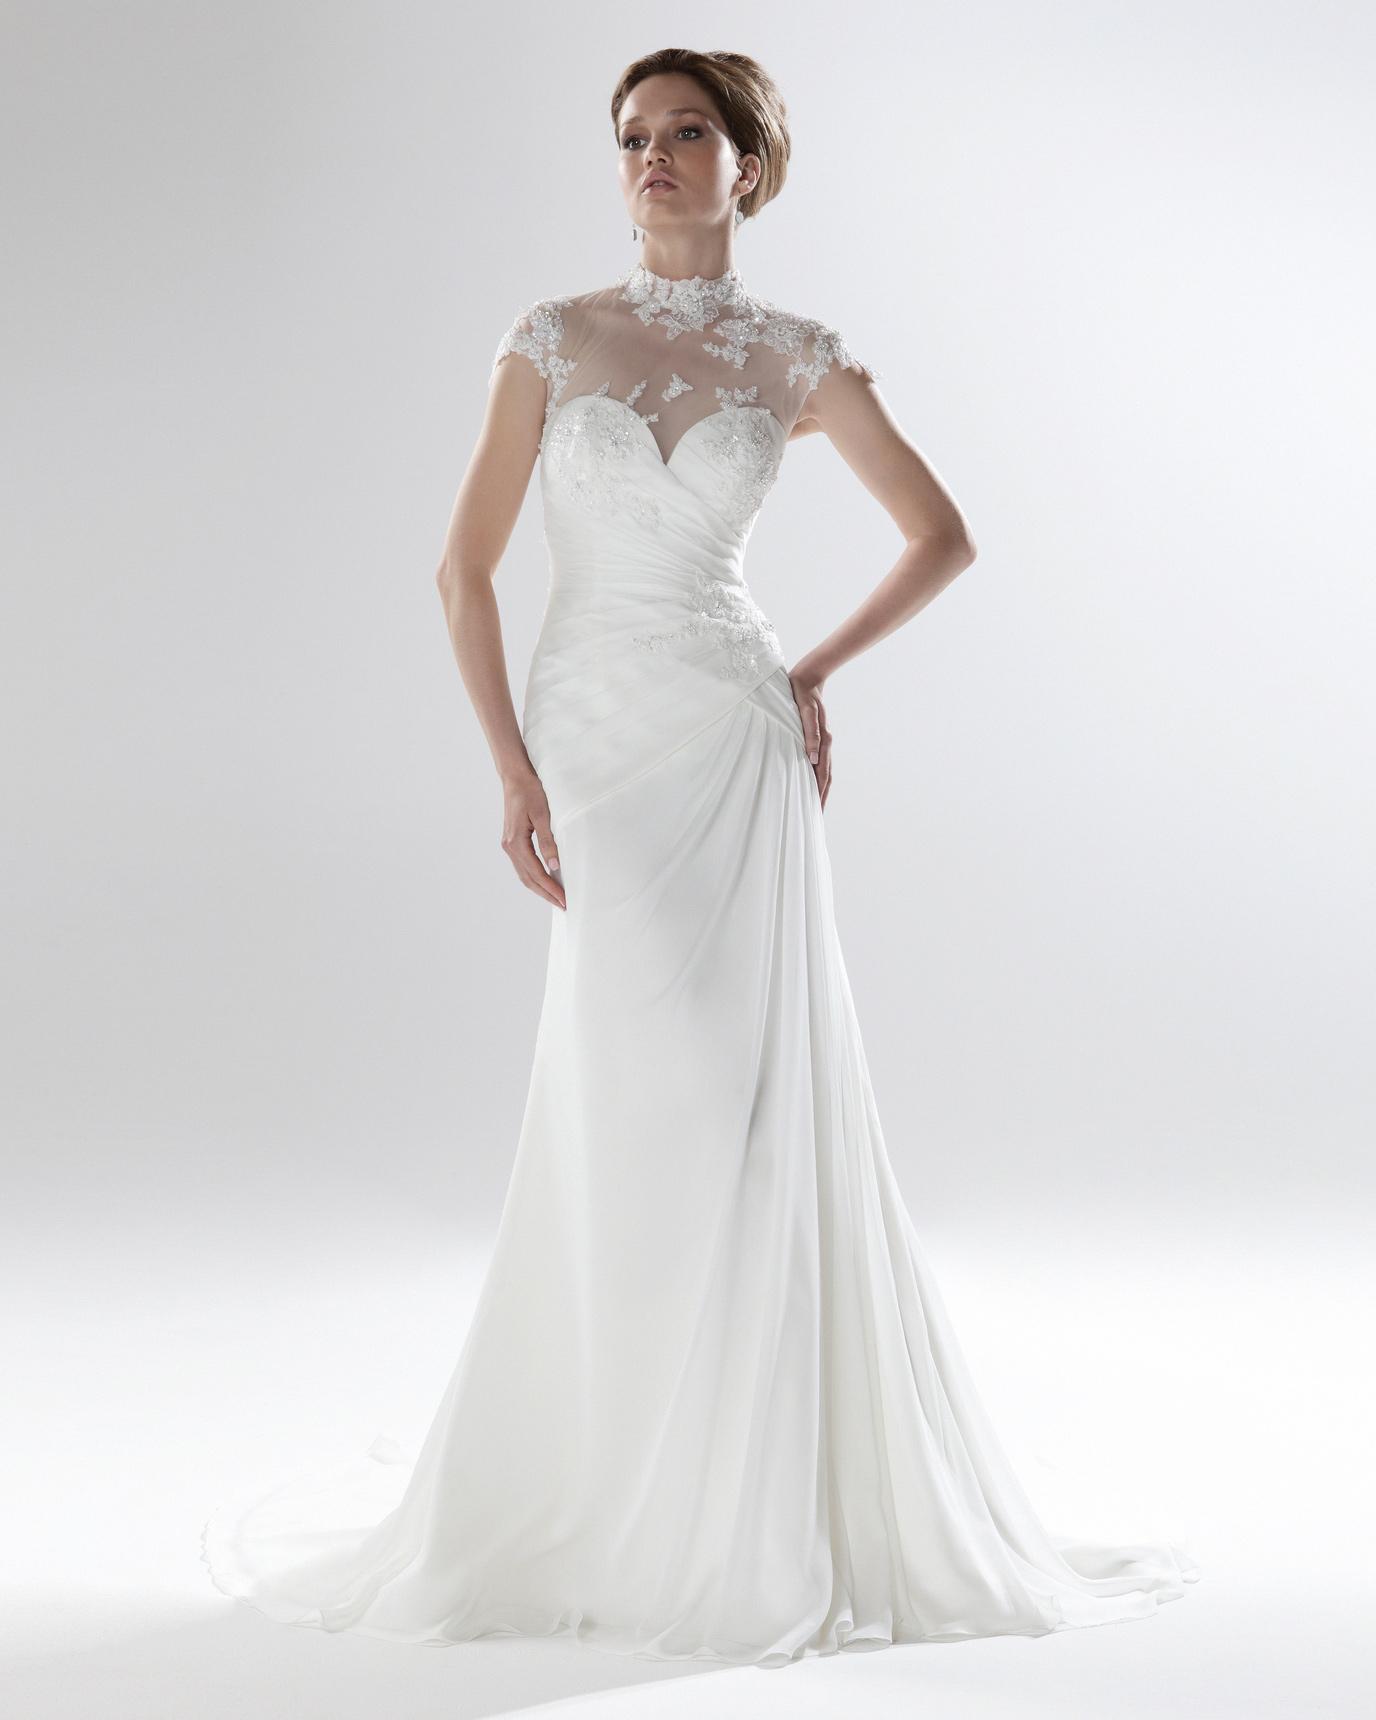 ellis-bridal-11184.jpg